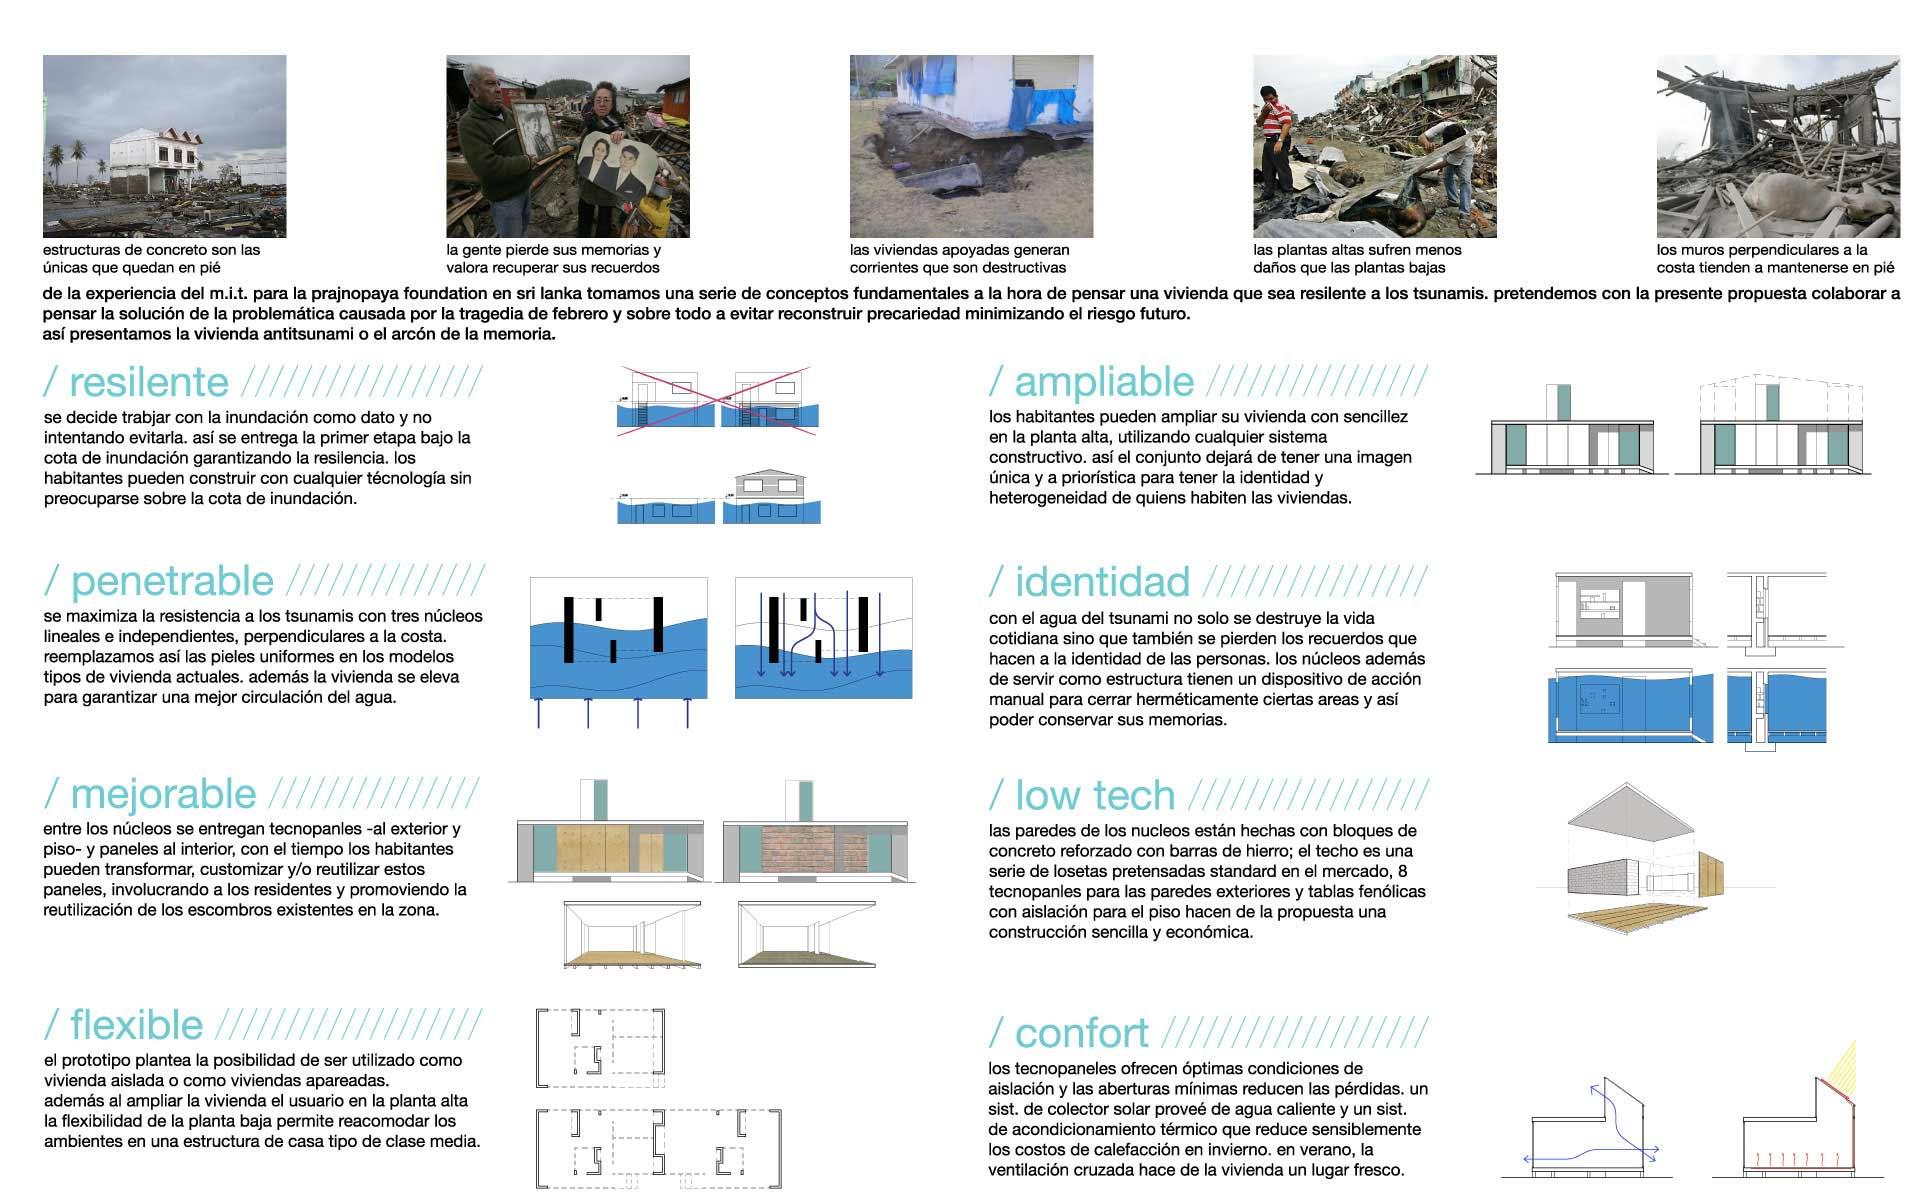 Arquitectura, diseño para catástrofes naturales. Lamina del concurso para viviendas tsunami resilientes en Chile